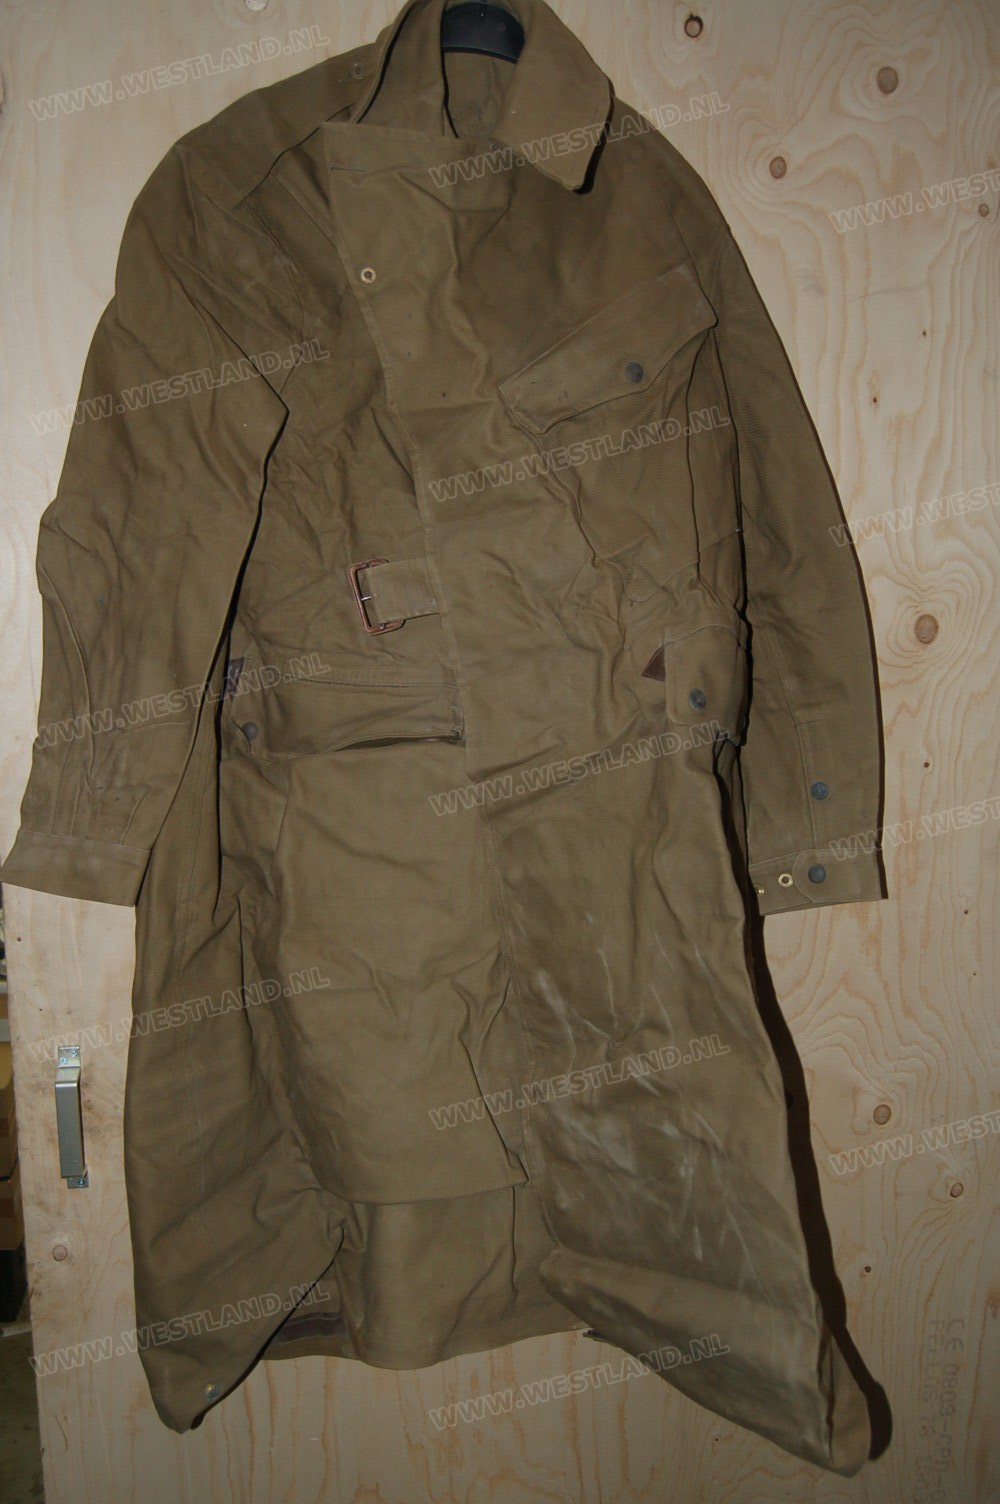 Wwii British Dispatch Riders Coat Mint Size 8